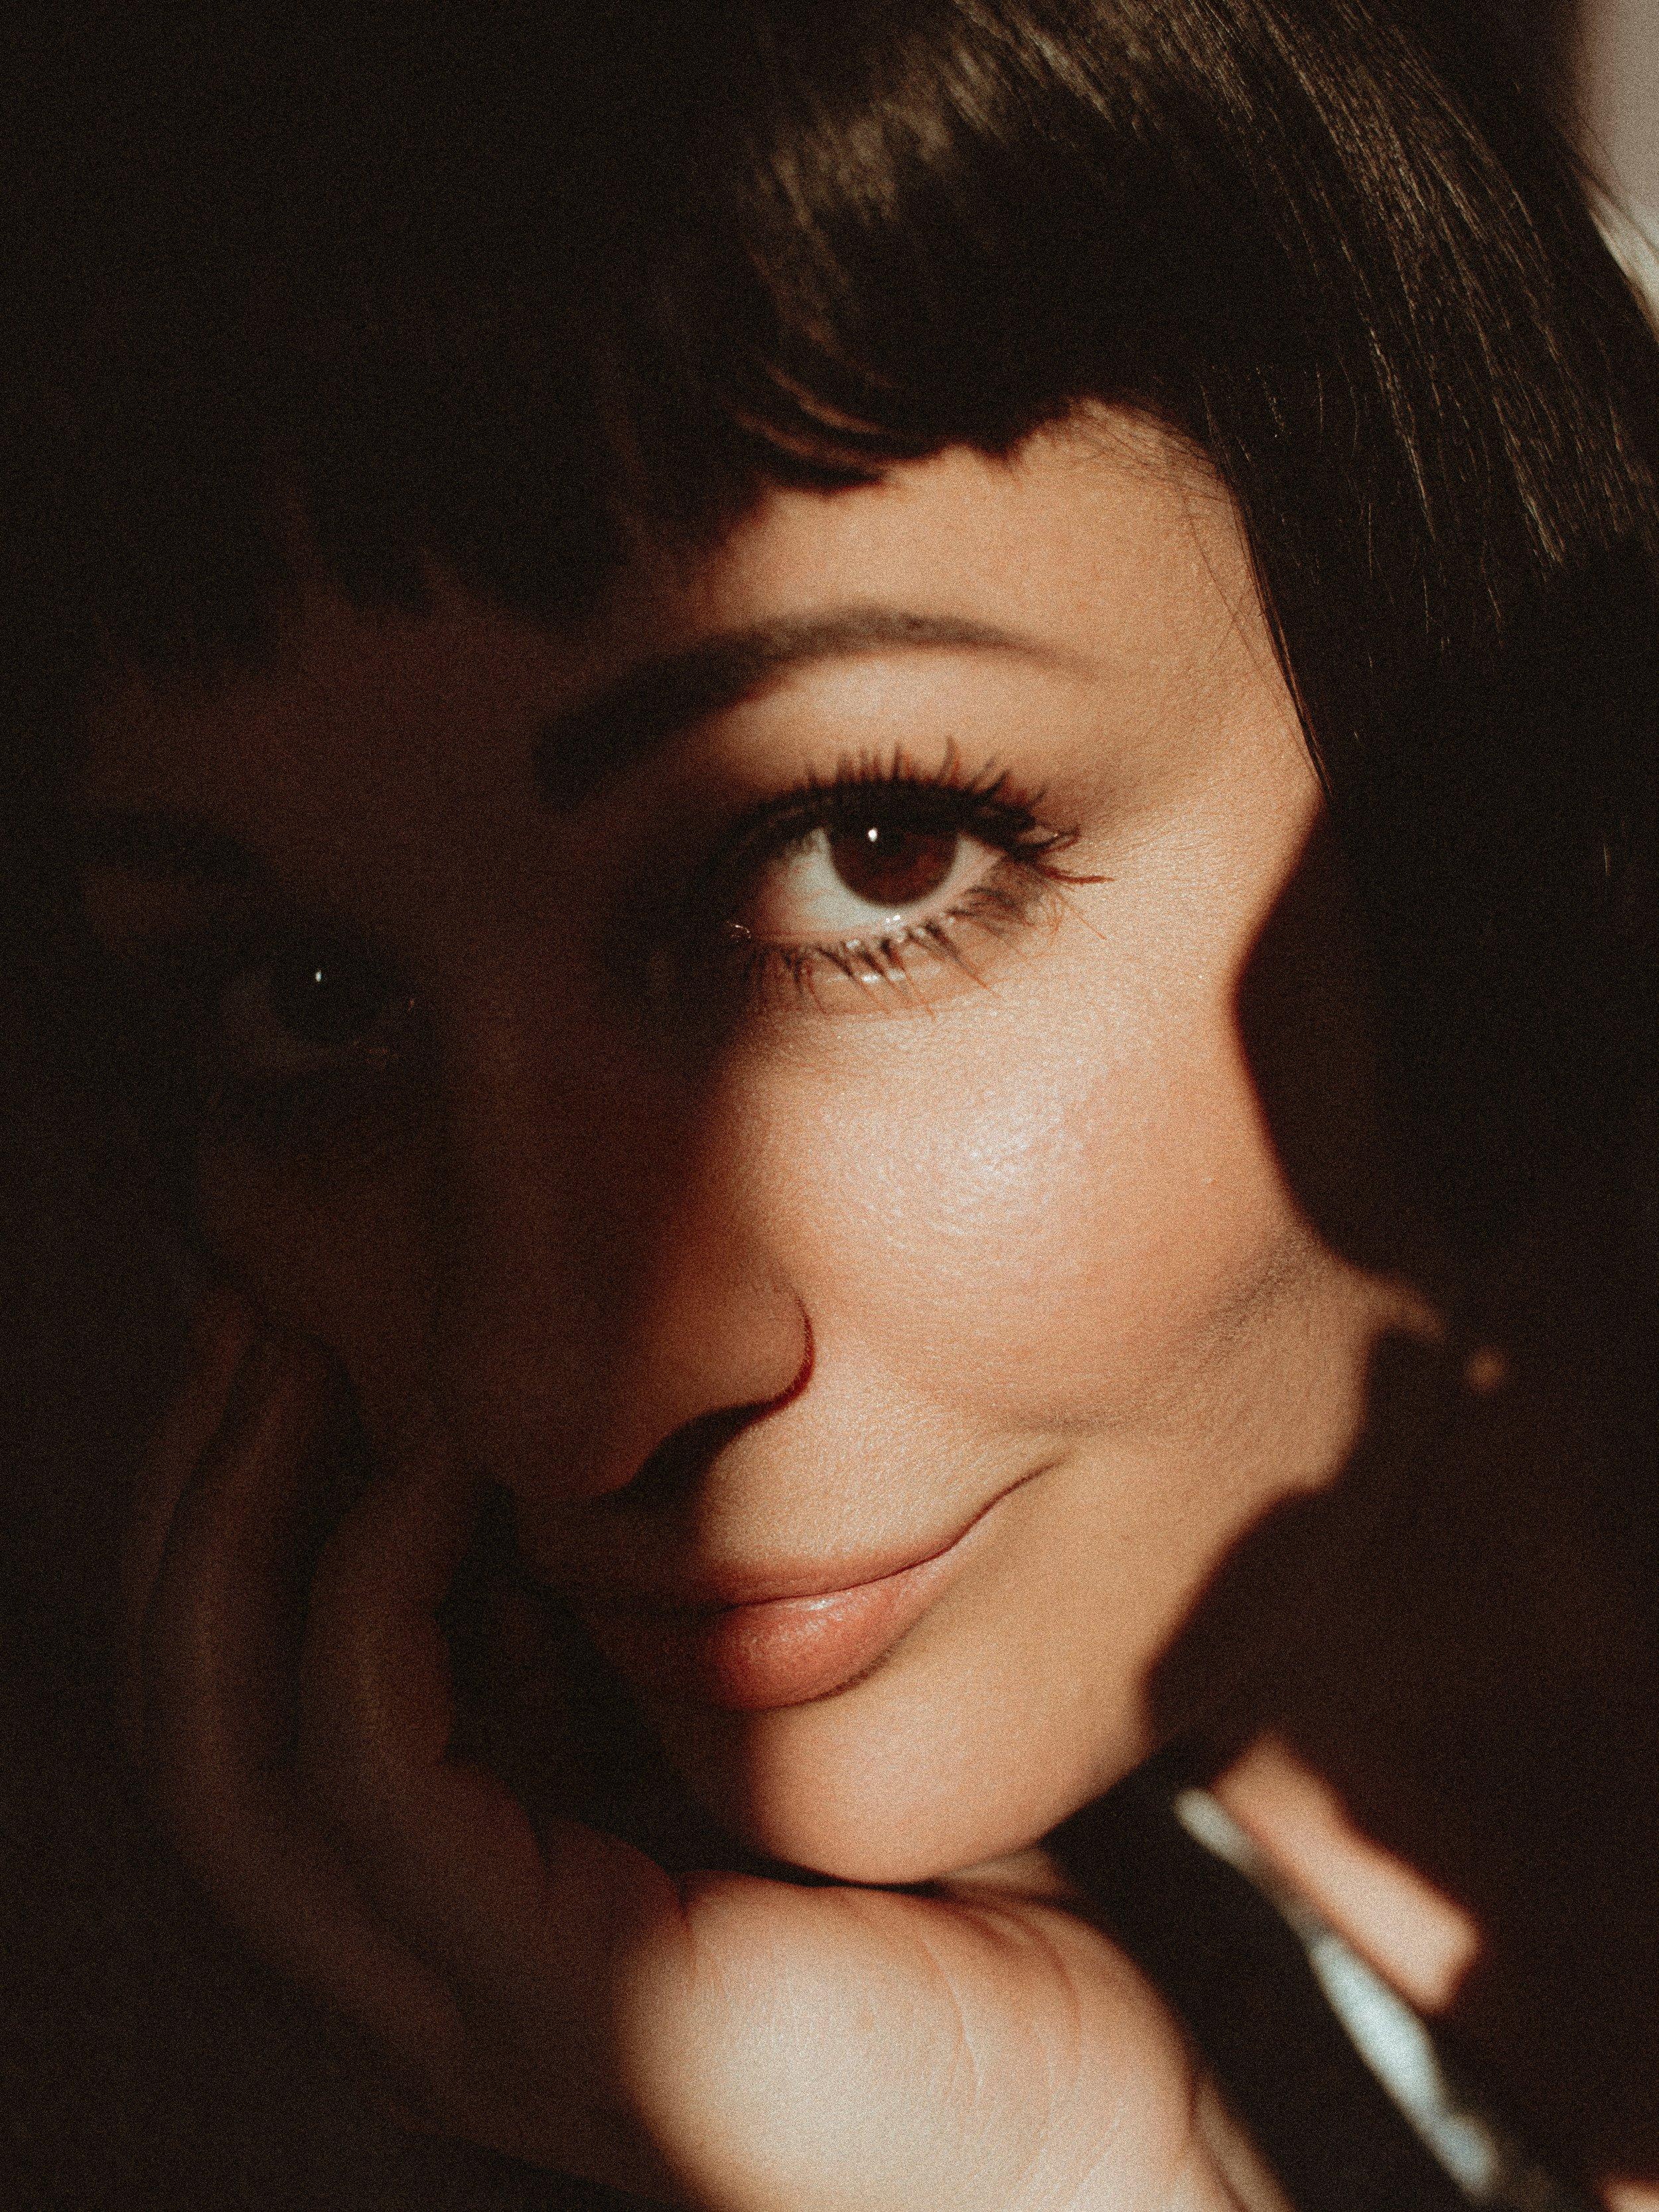 close-up-dark-hair-eyebrows-2600351.jpg